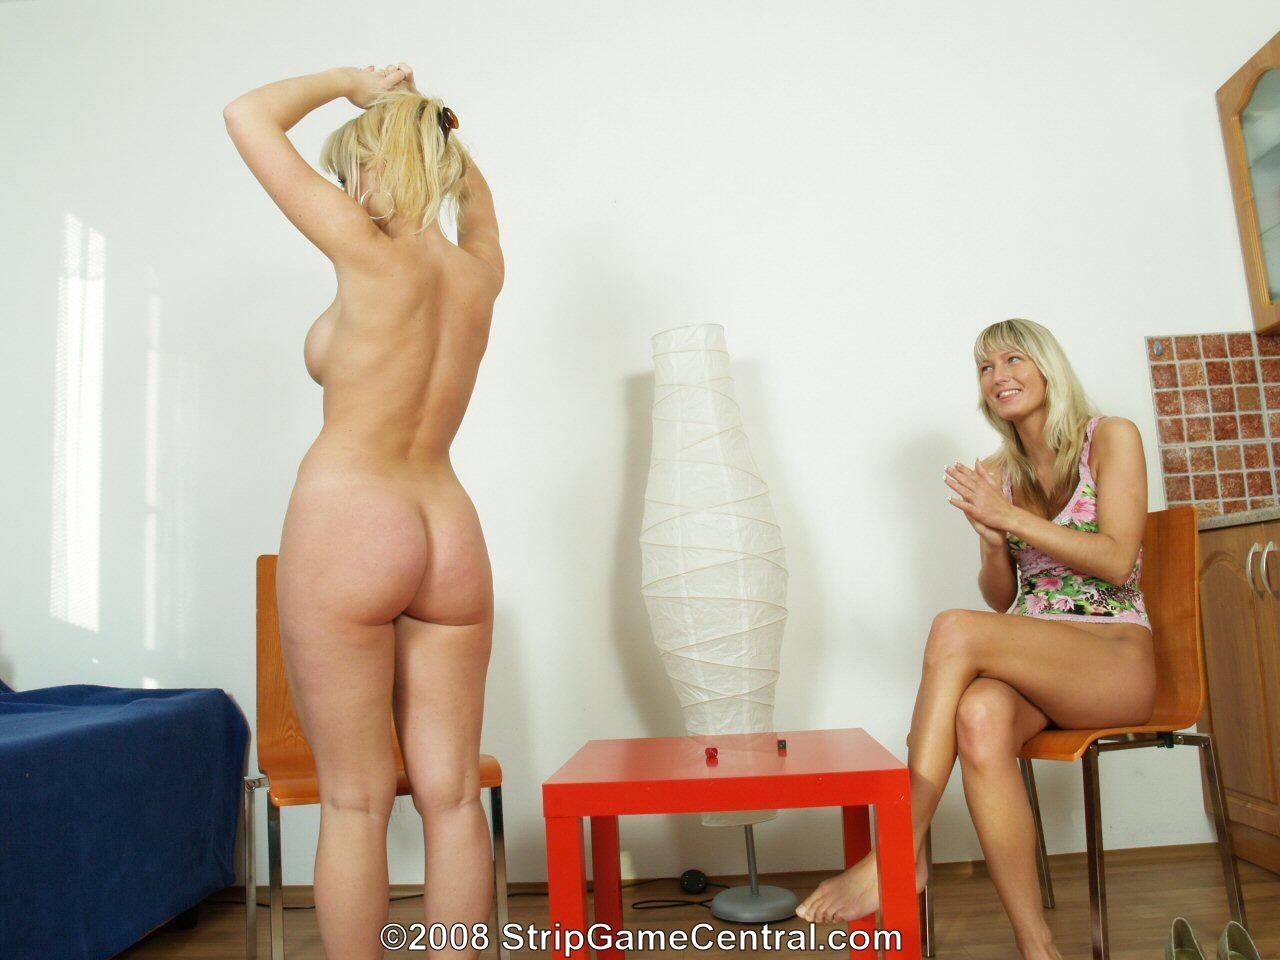 StripGameCentral:Nudity in strip games